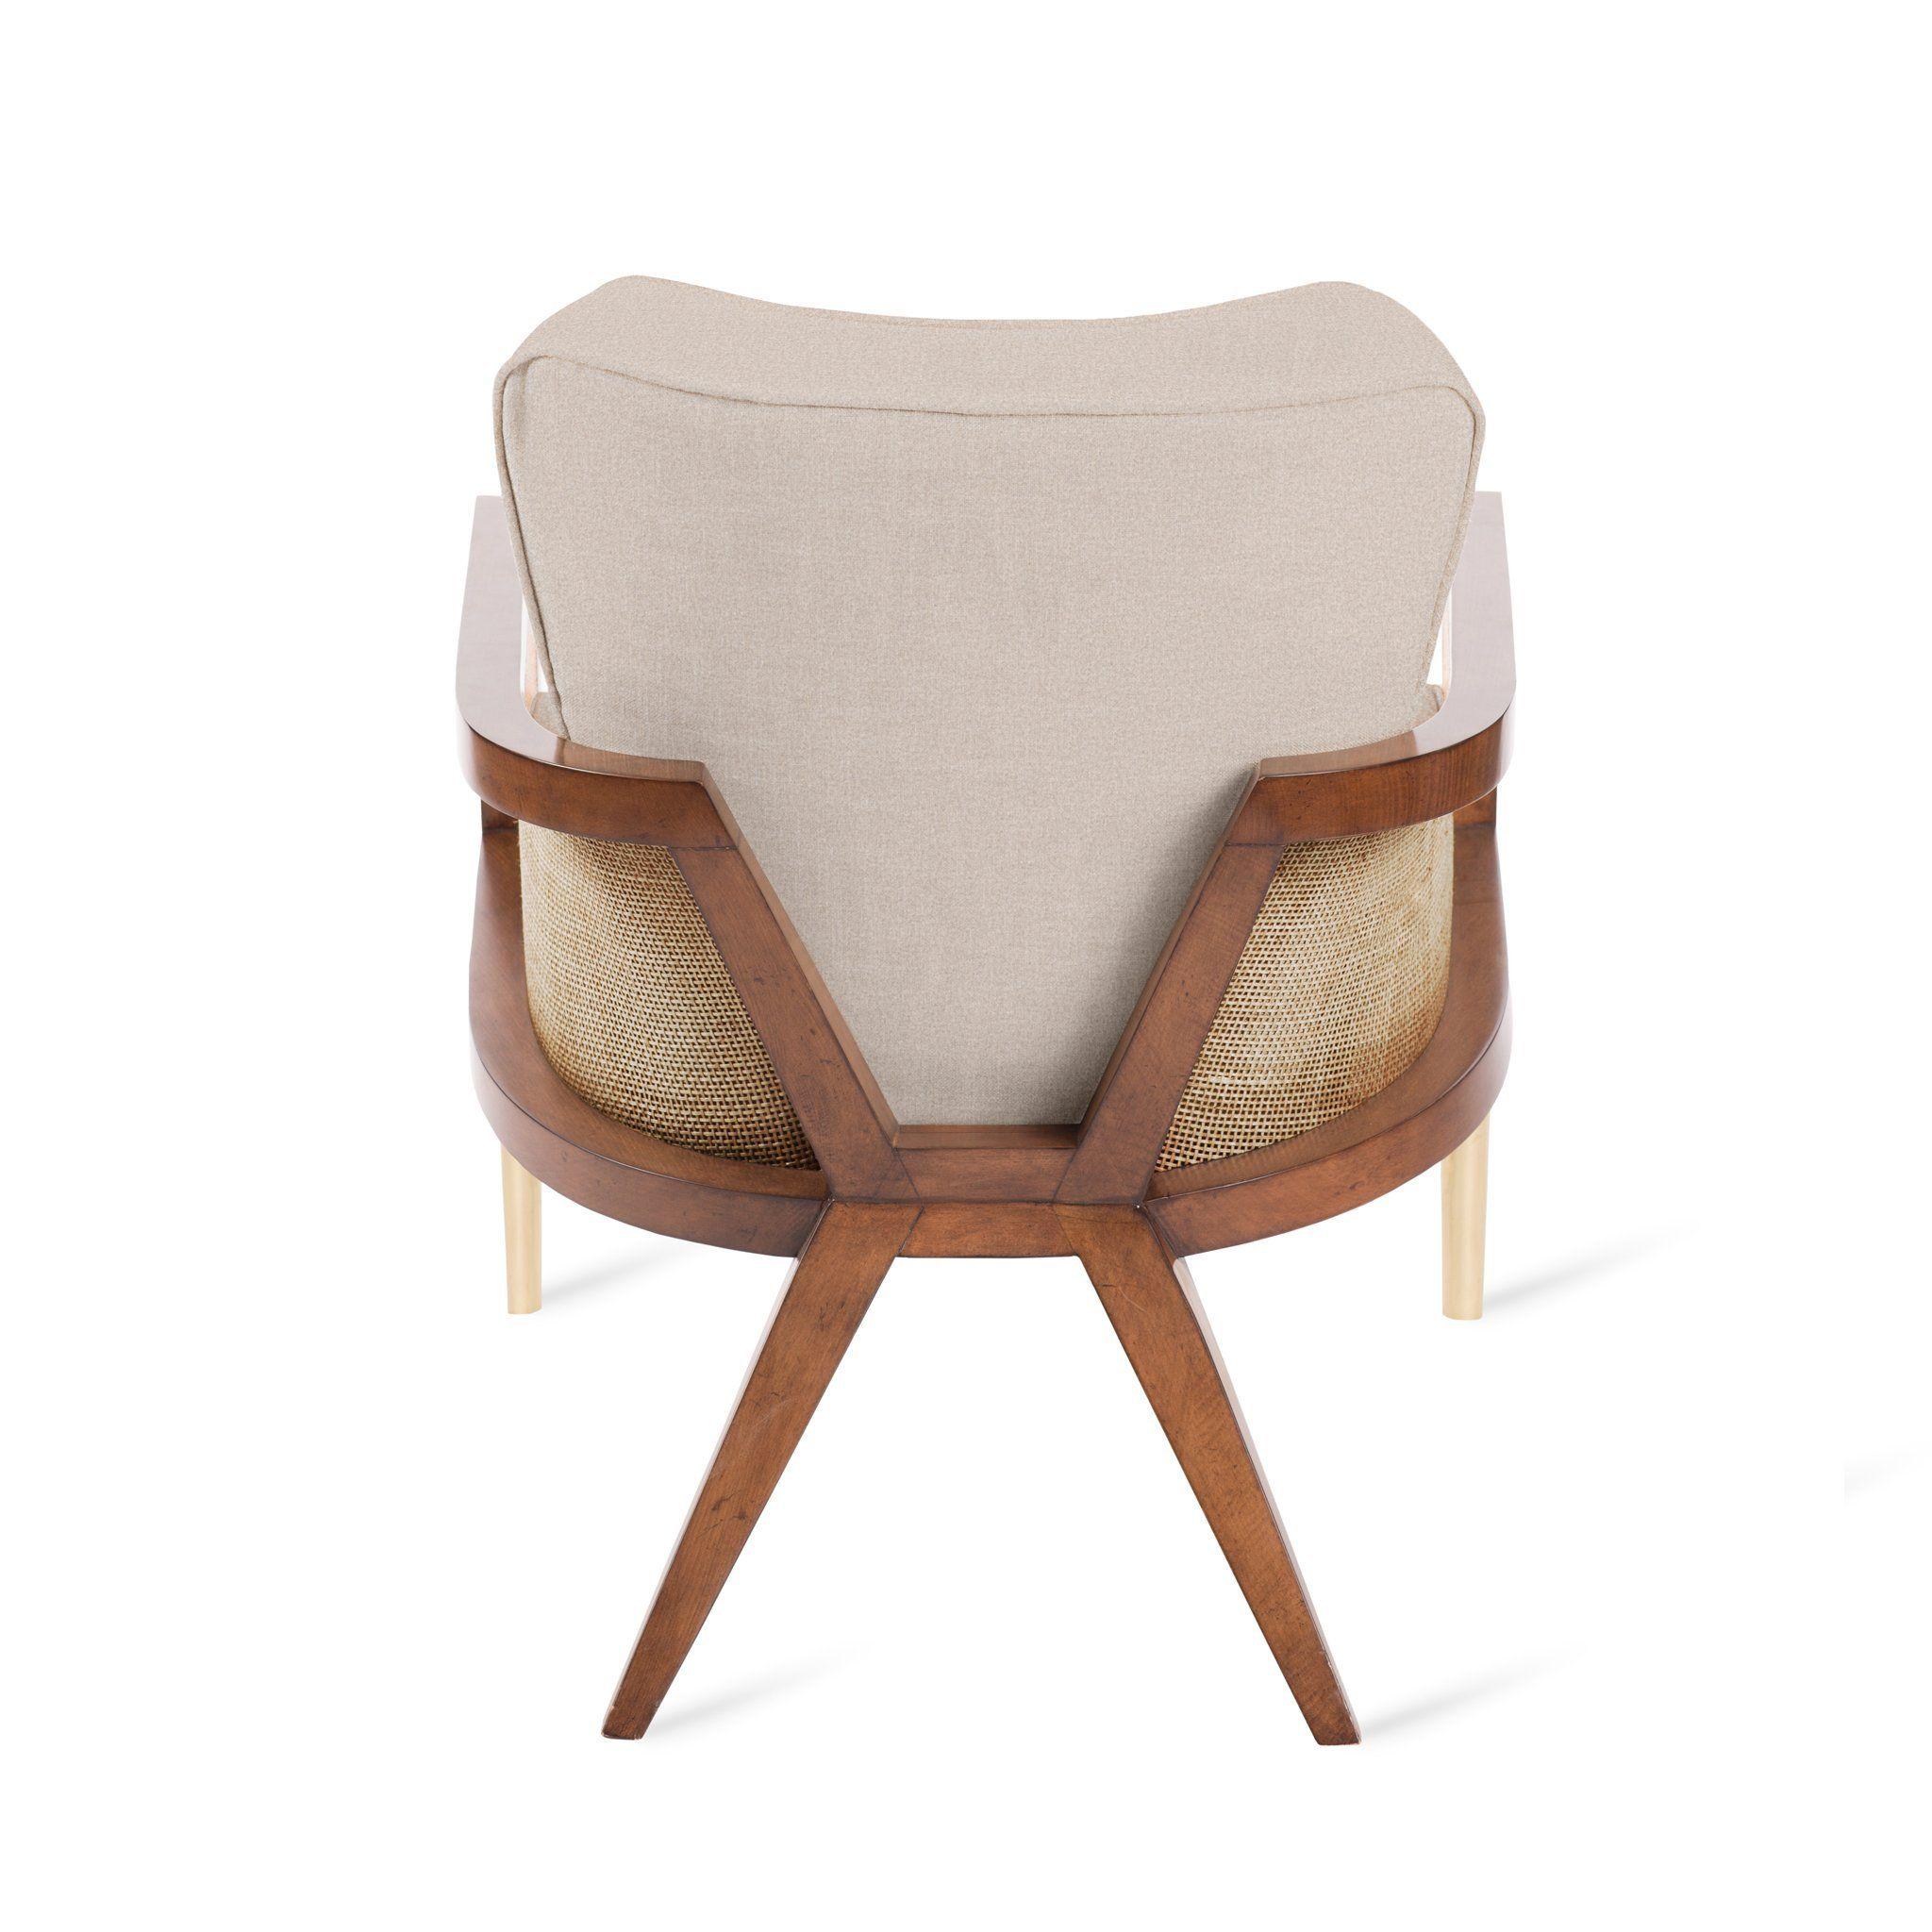 Grant Lounge Chair Interior Design Trends 2018 Interior Design Trends New Interior Design